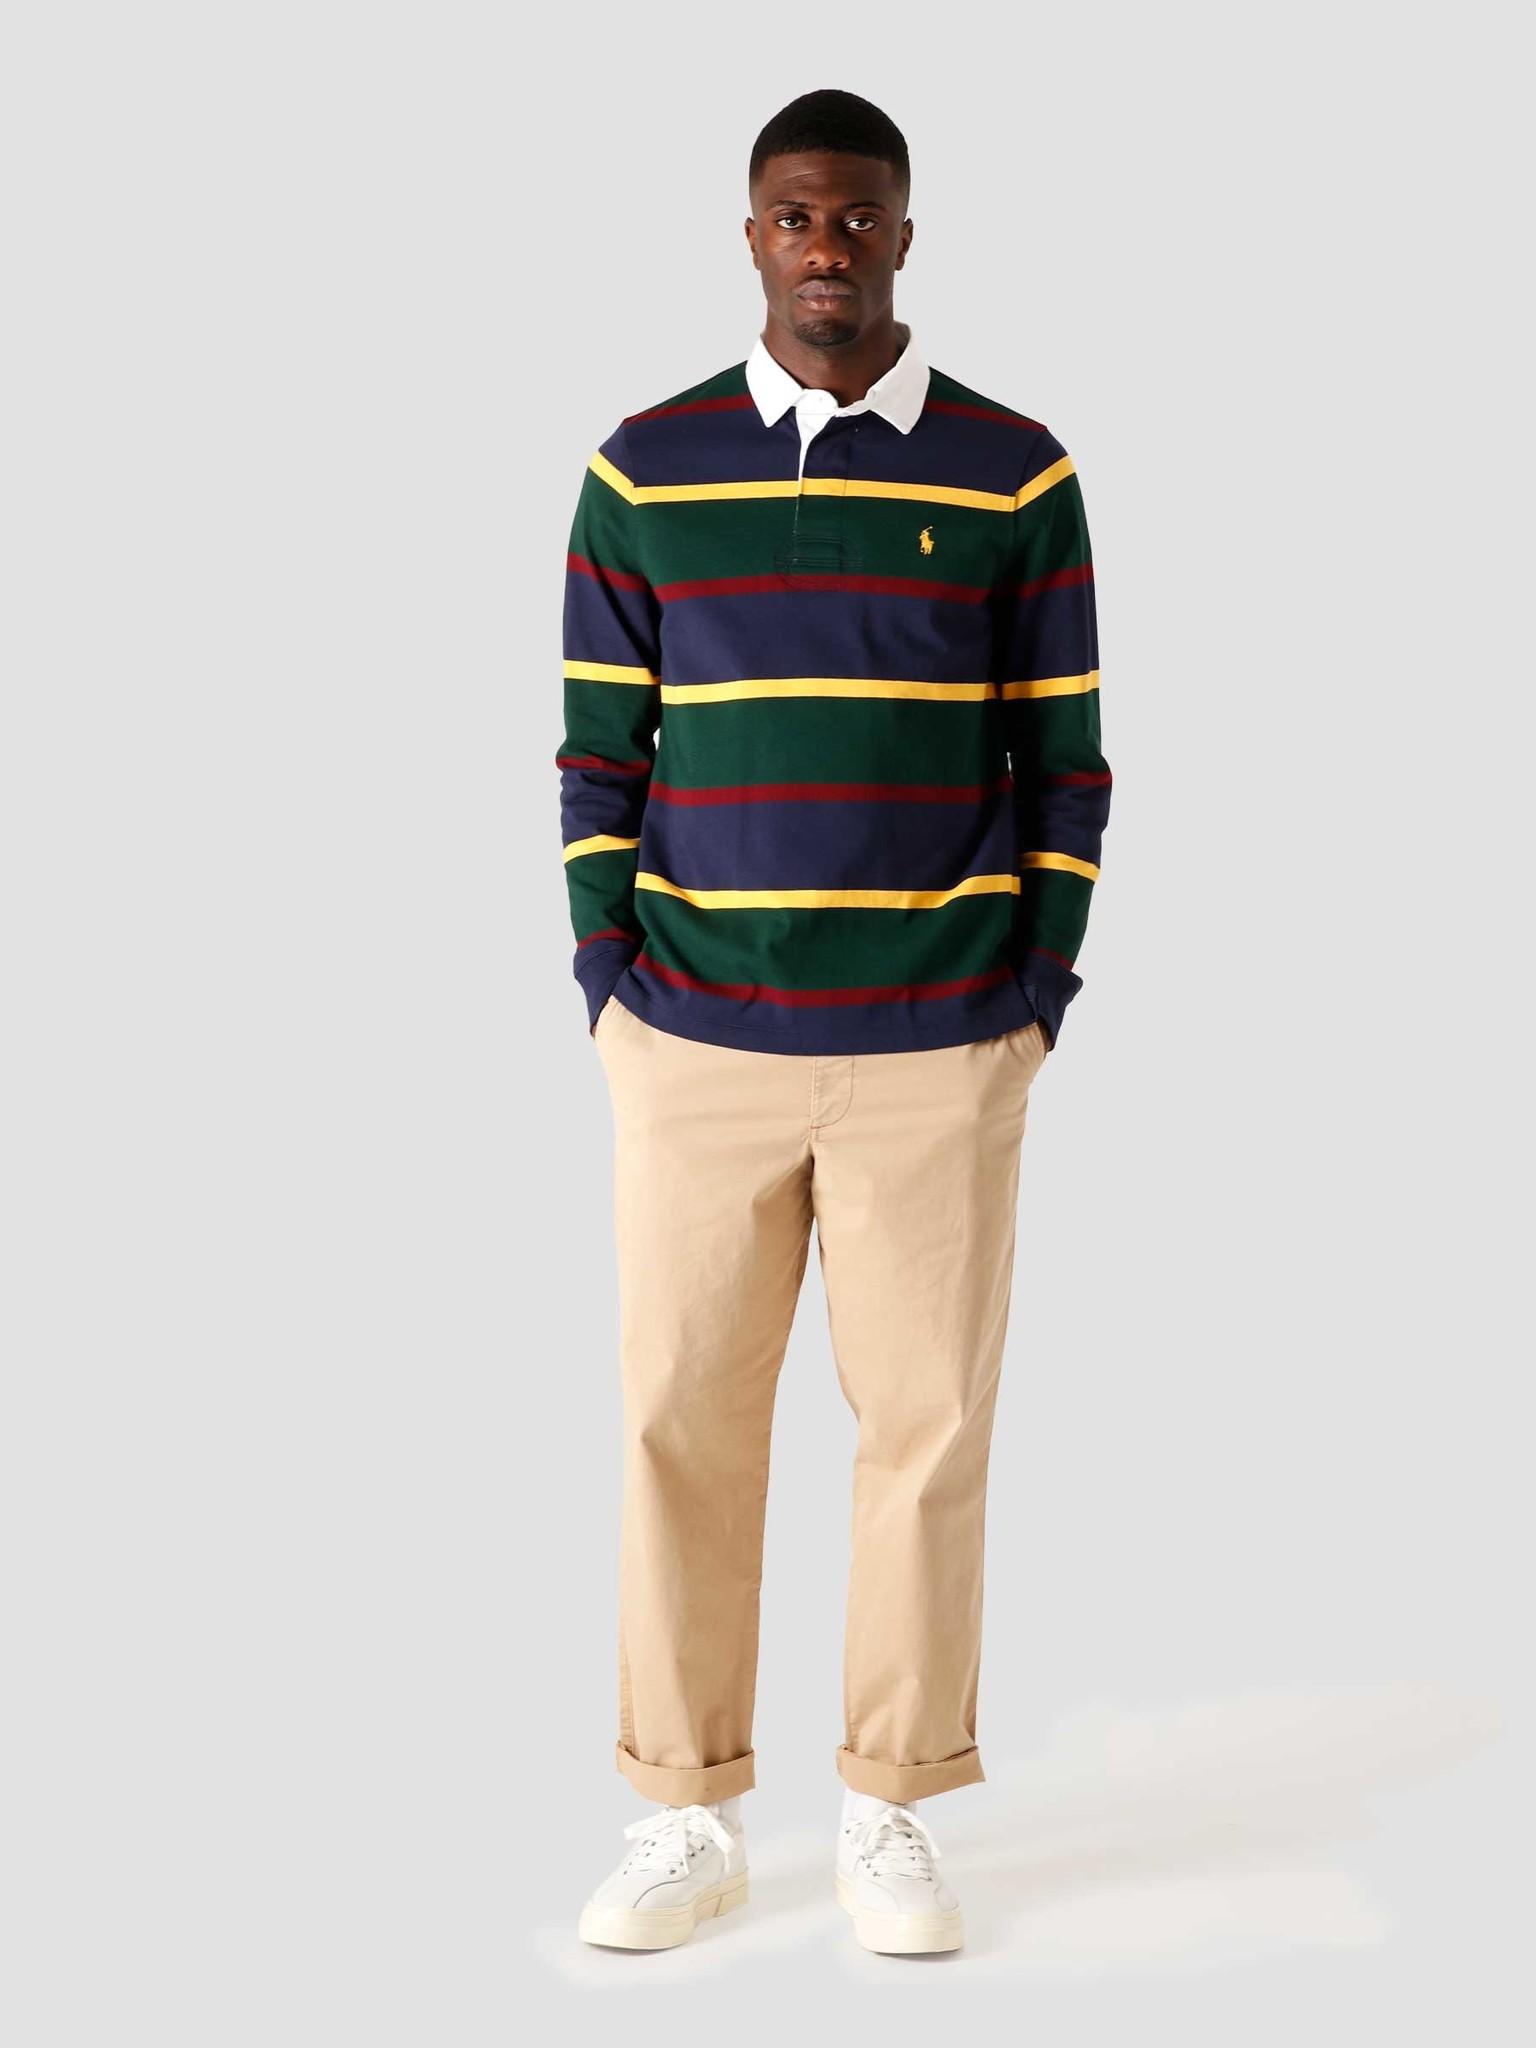 Polo Ralph Lauren Polo Ralph Lauren Long Sleeve Knitted Sweater College Green Multi 710818479003